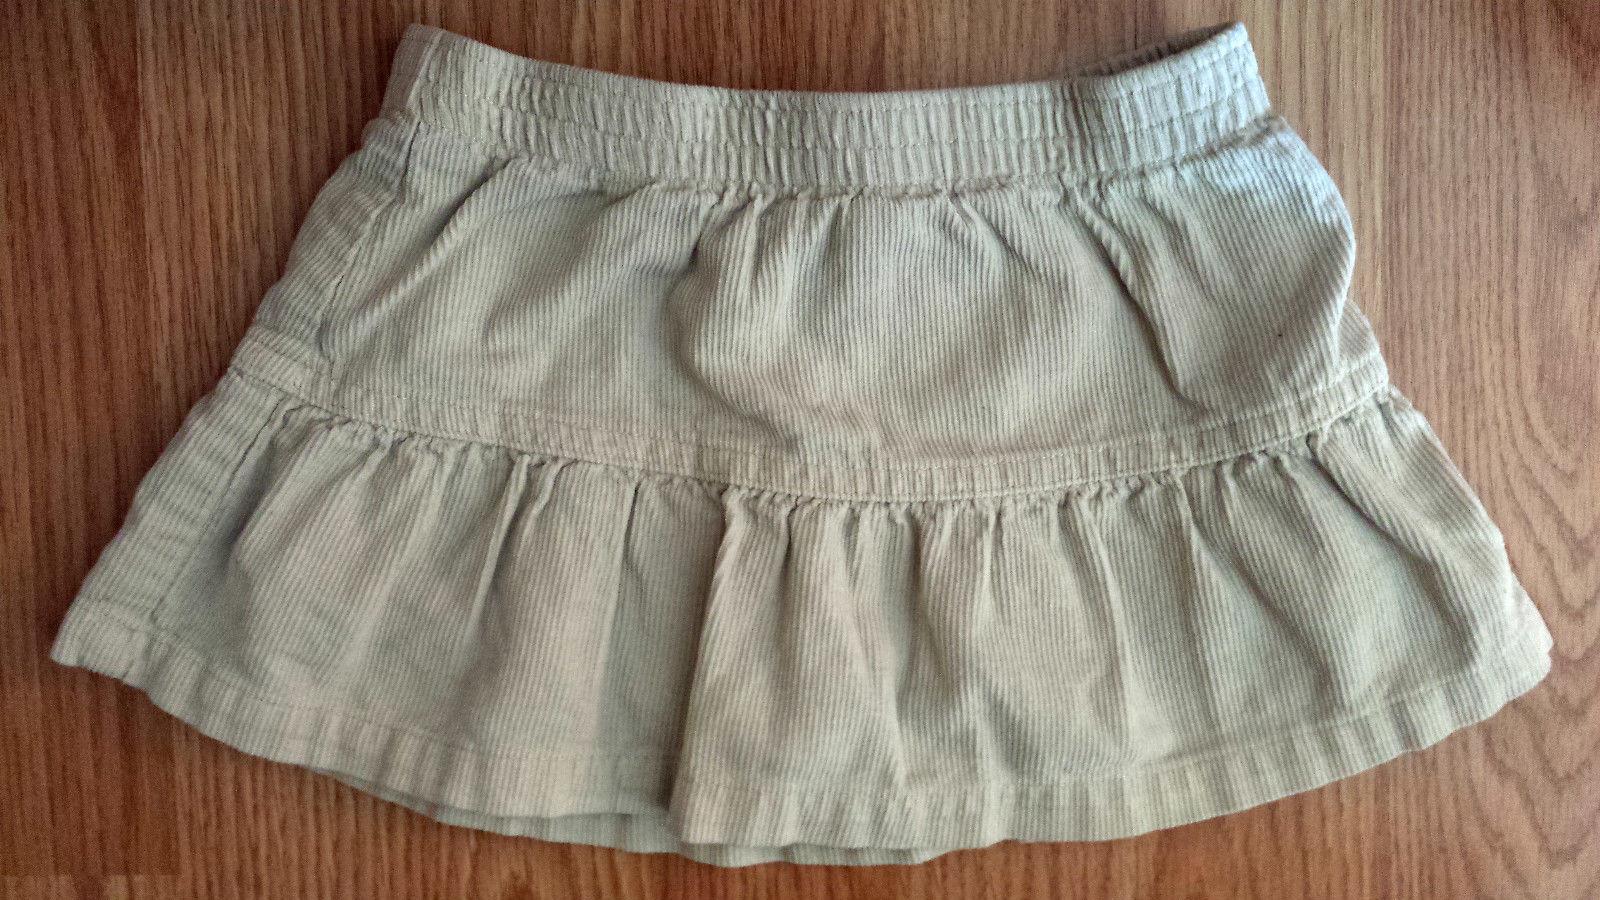 Girl's Size 2T Two Piece Bright Orange Old Navy Top & Corduroy Okie Dokie Skirt